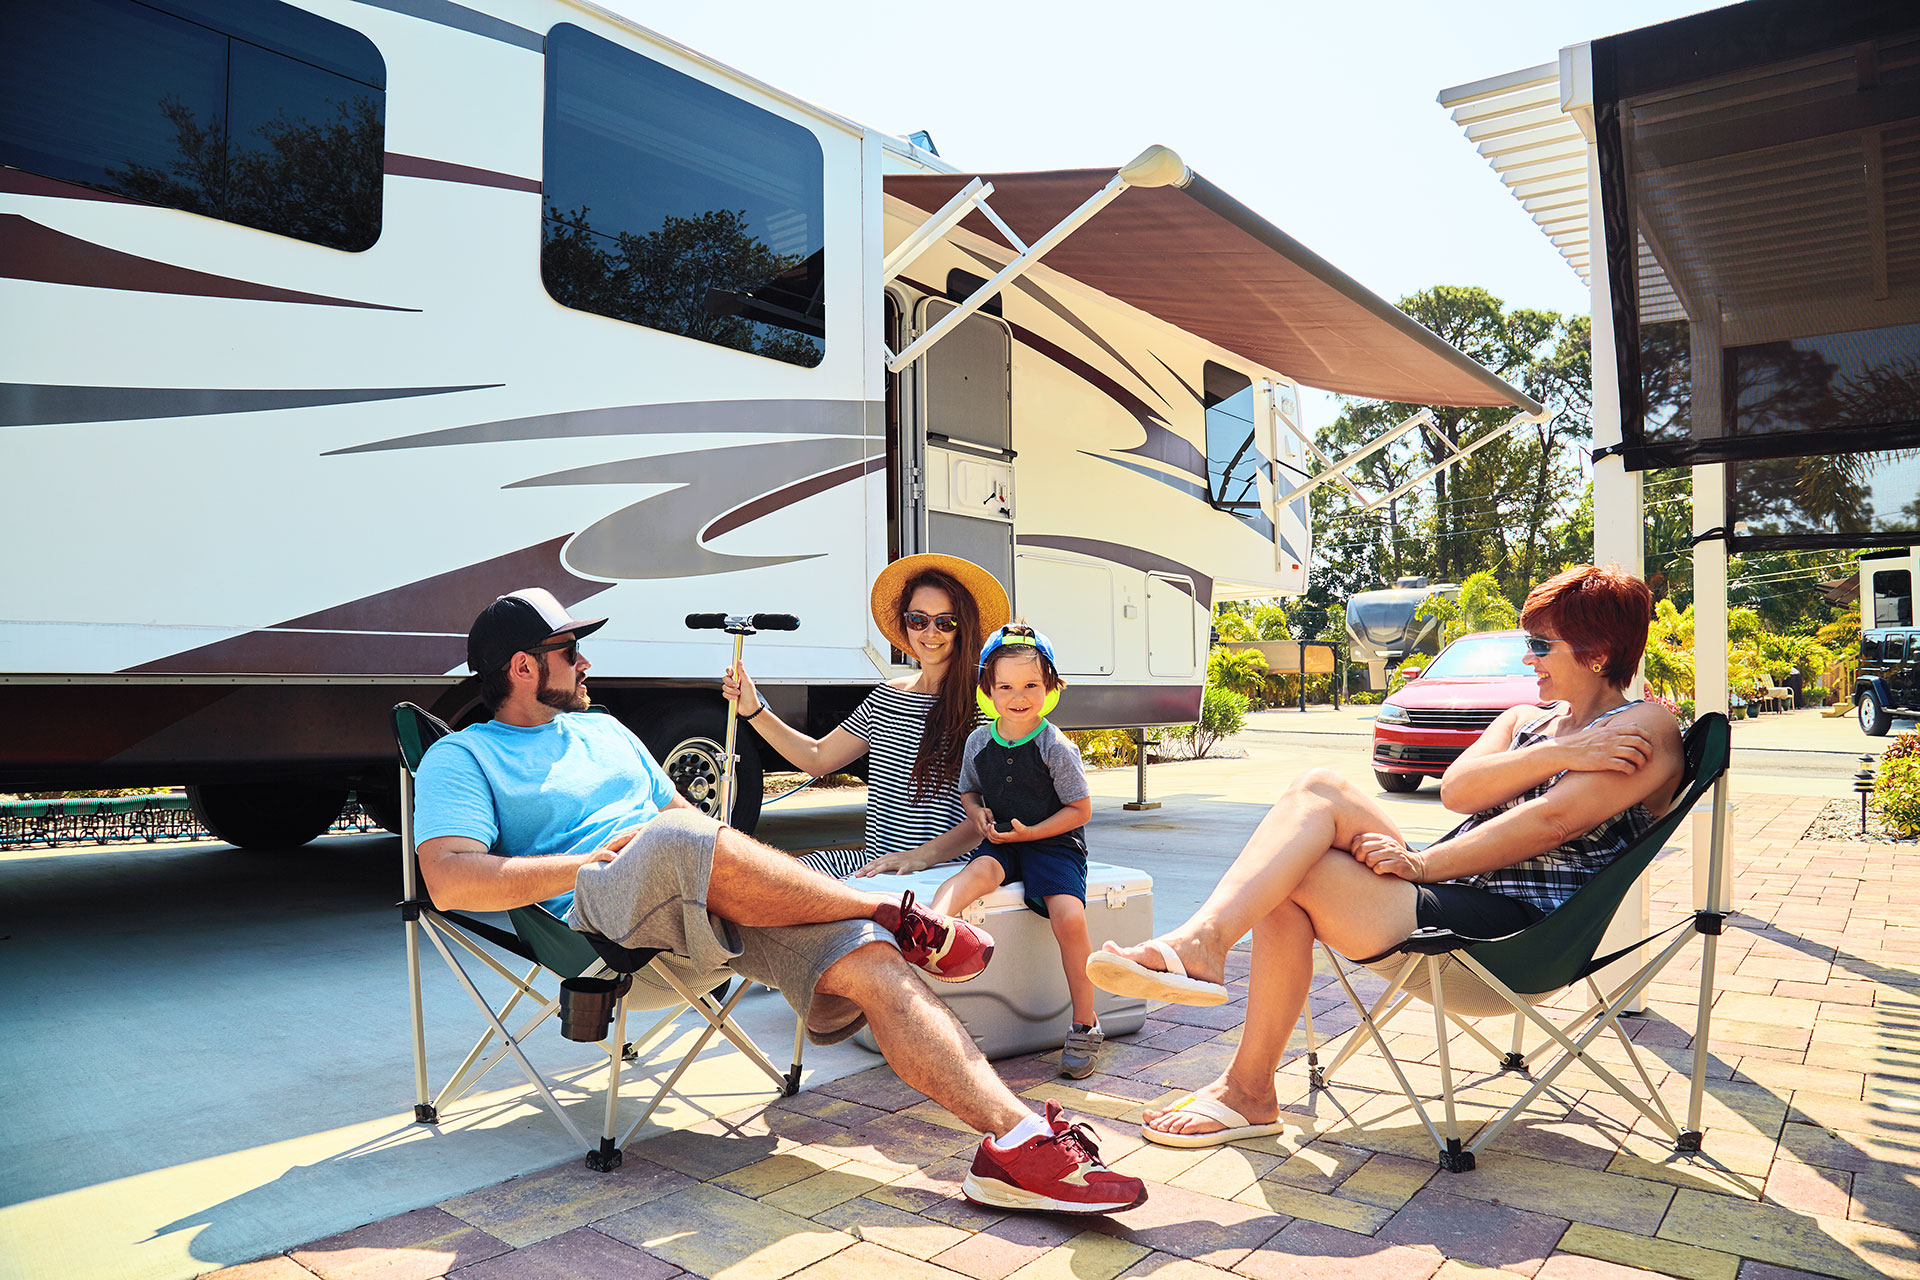 Family With RV; Courtesy of Lazor/Shutterstock.com